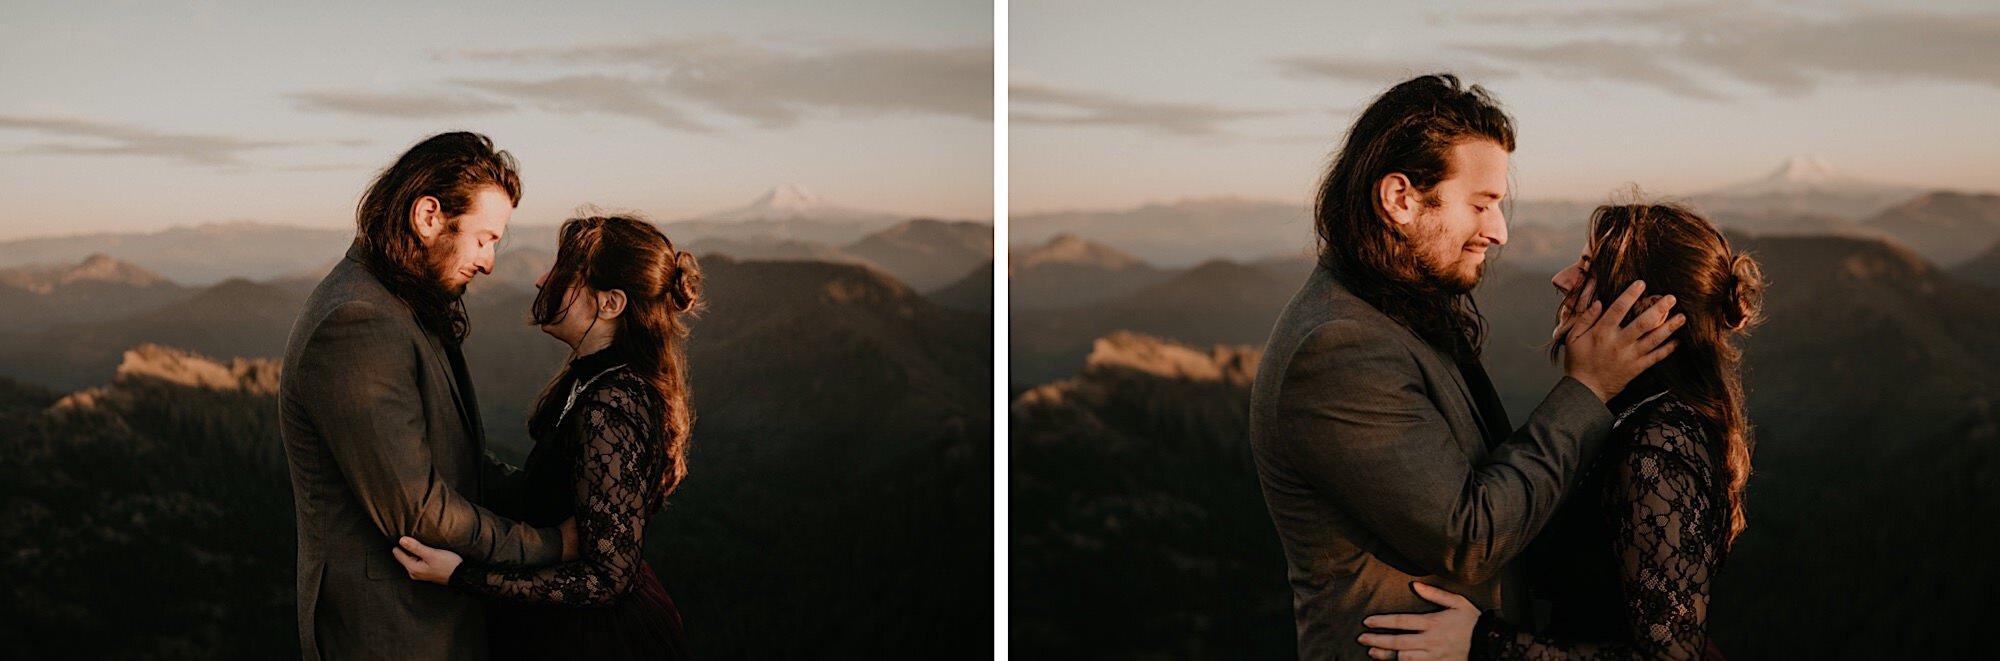 mount-rainier-hiking-adventure-elopement-10.jpg